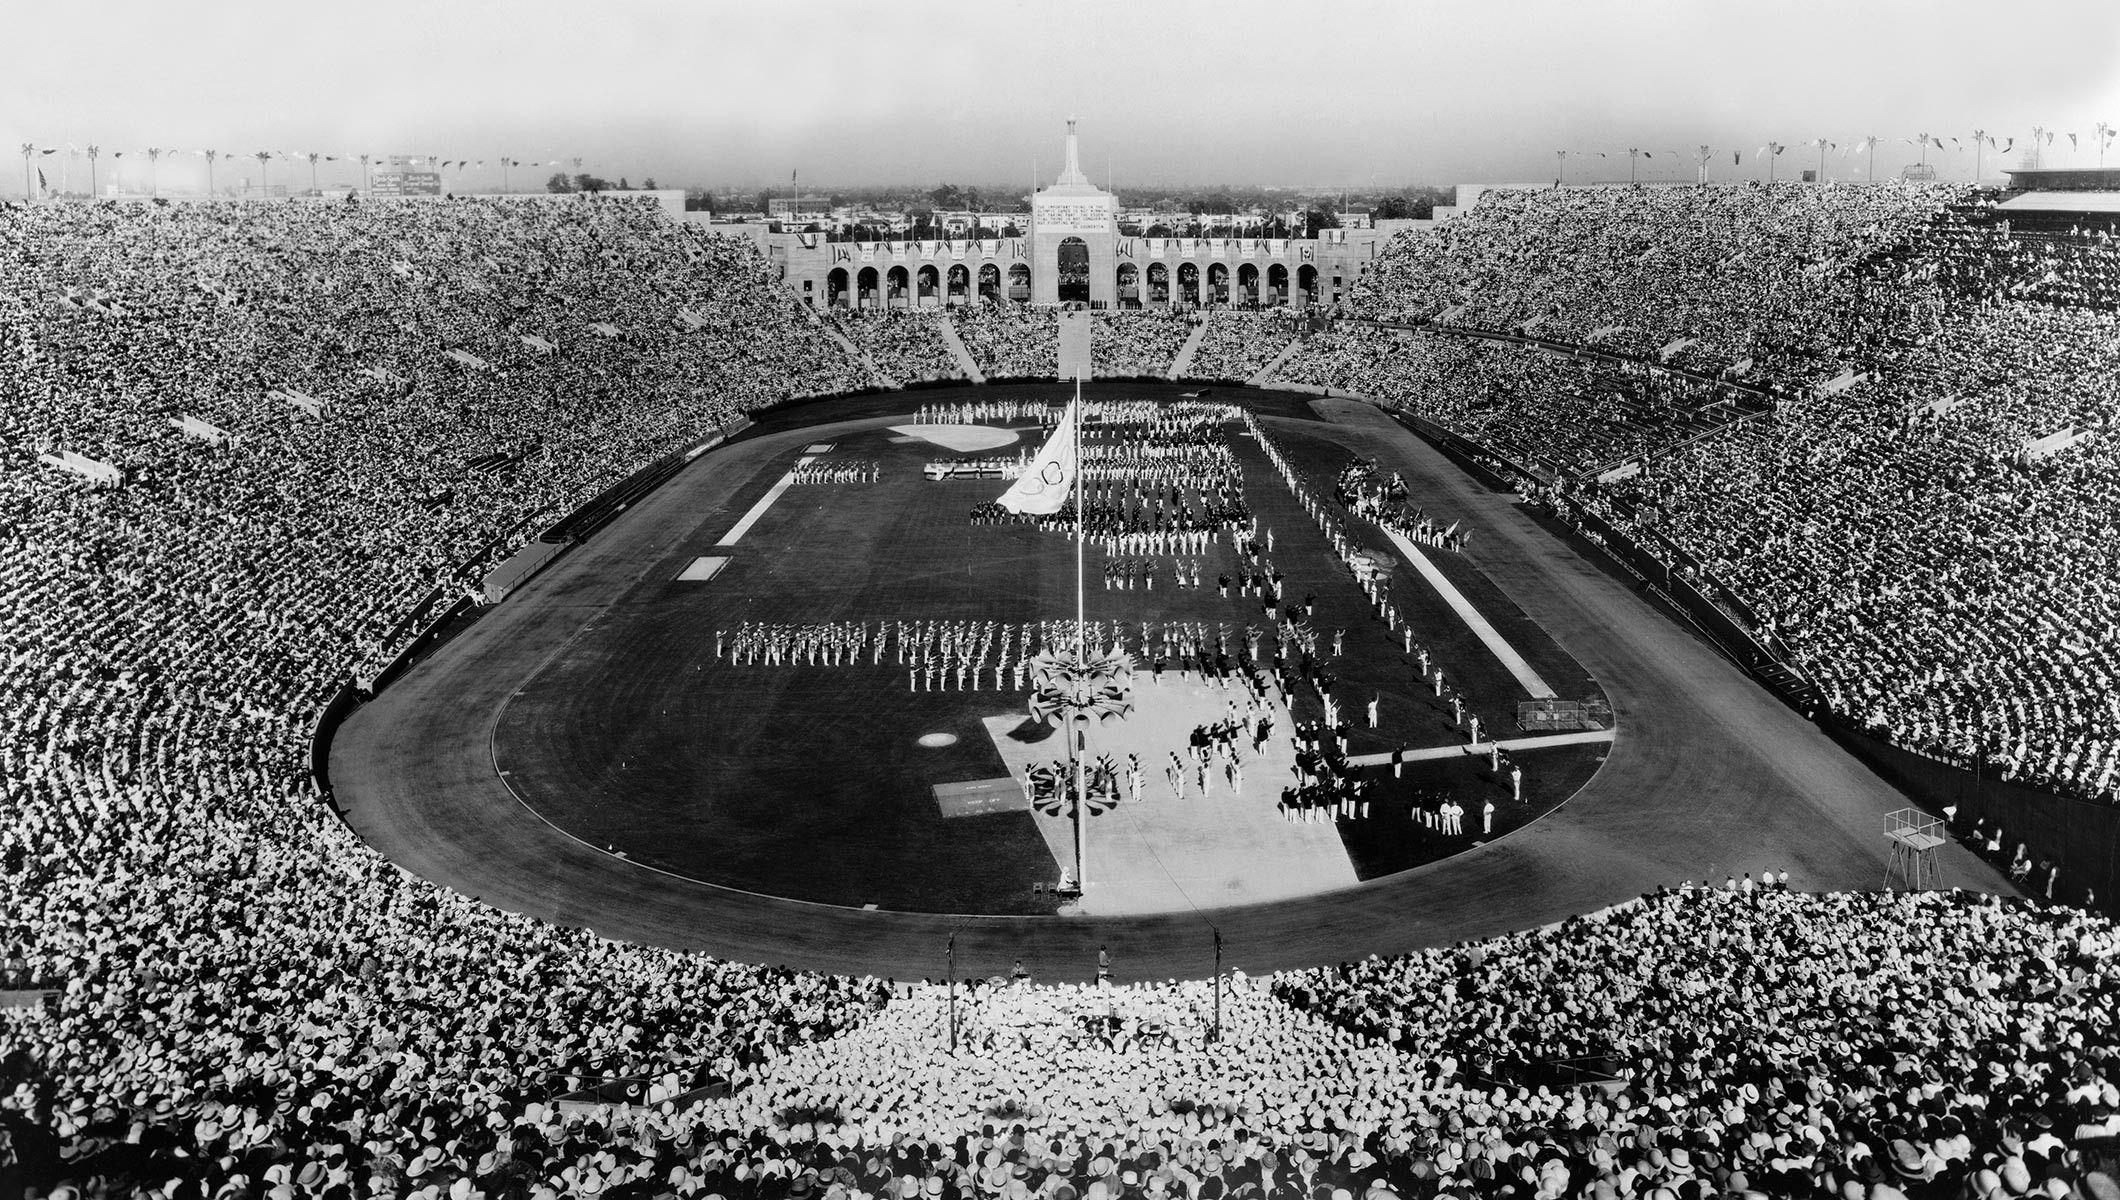 960 Los Angeles Memorial Coliseum Los Angeles County Los Angeles Historical Landmarks